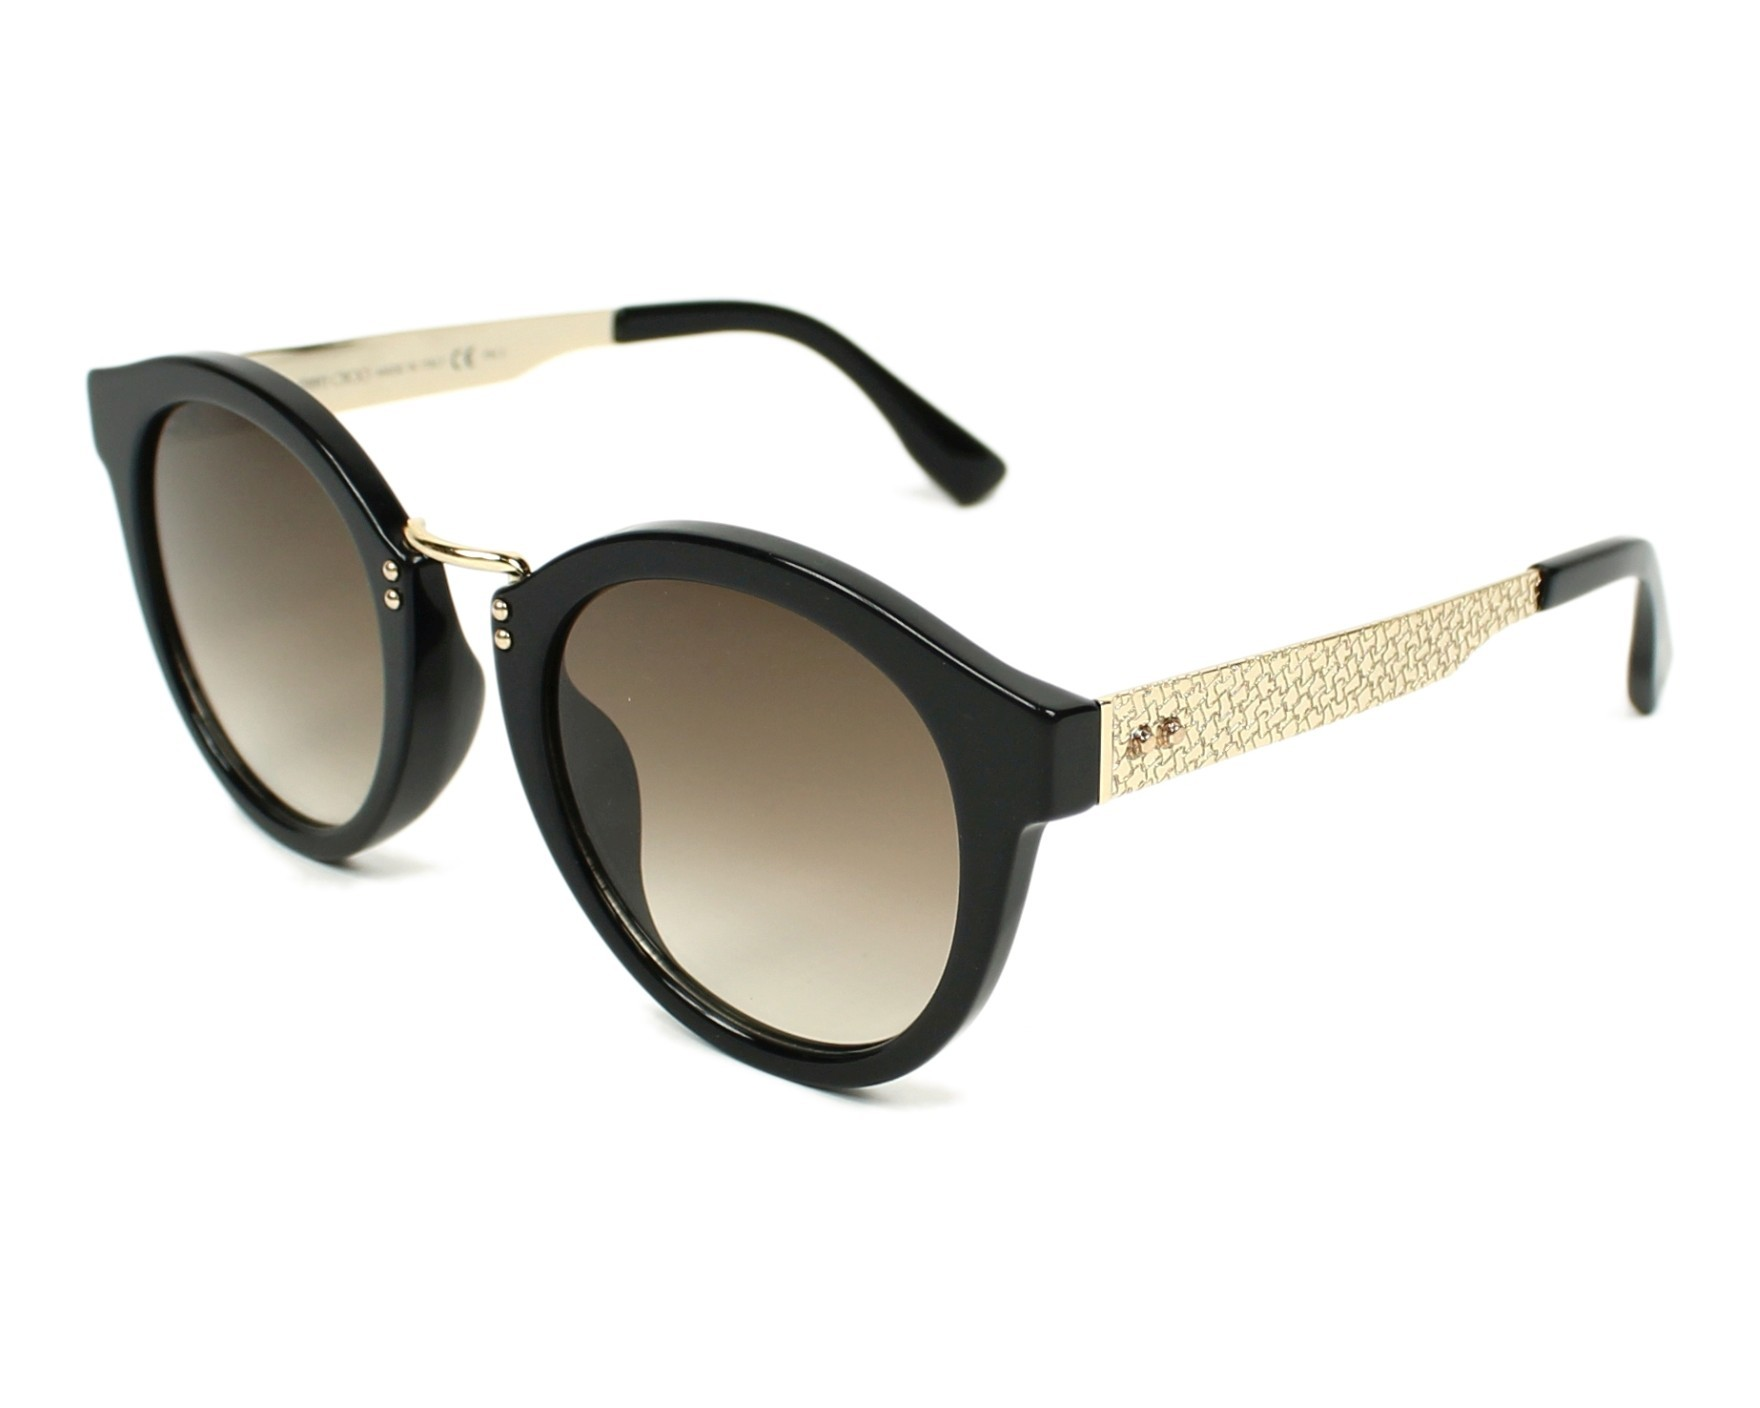 18e189d88bf Sunglasses Jimmy Choo PEPY-S QFE JD 50-22 Black Gold profile view